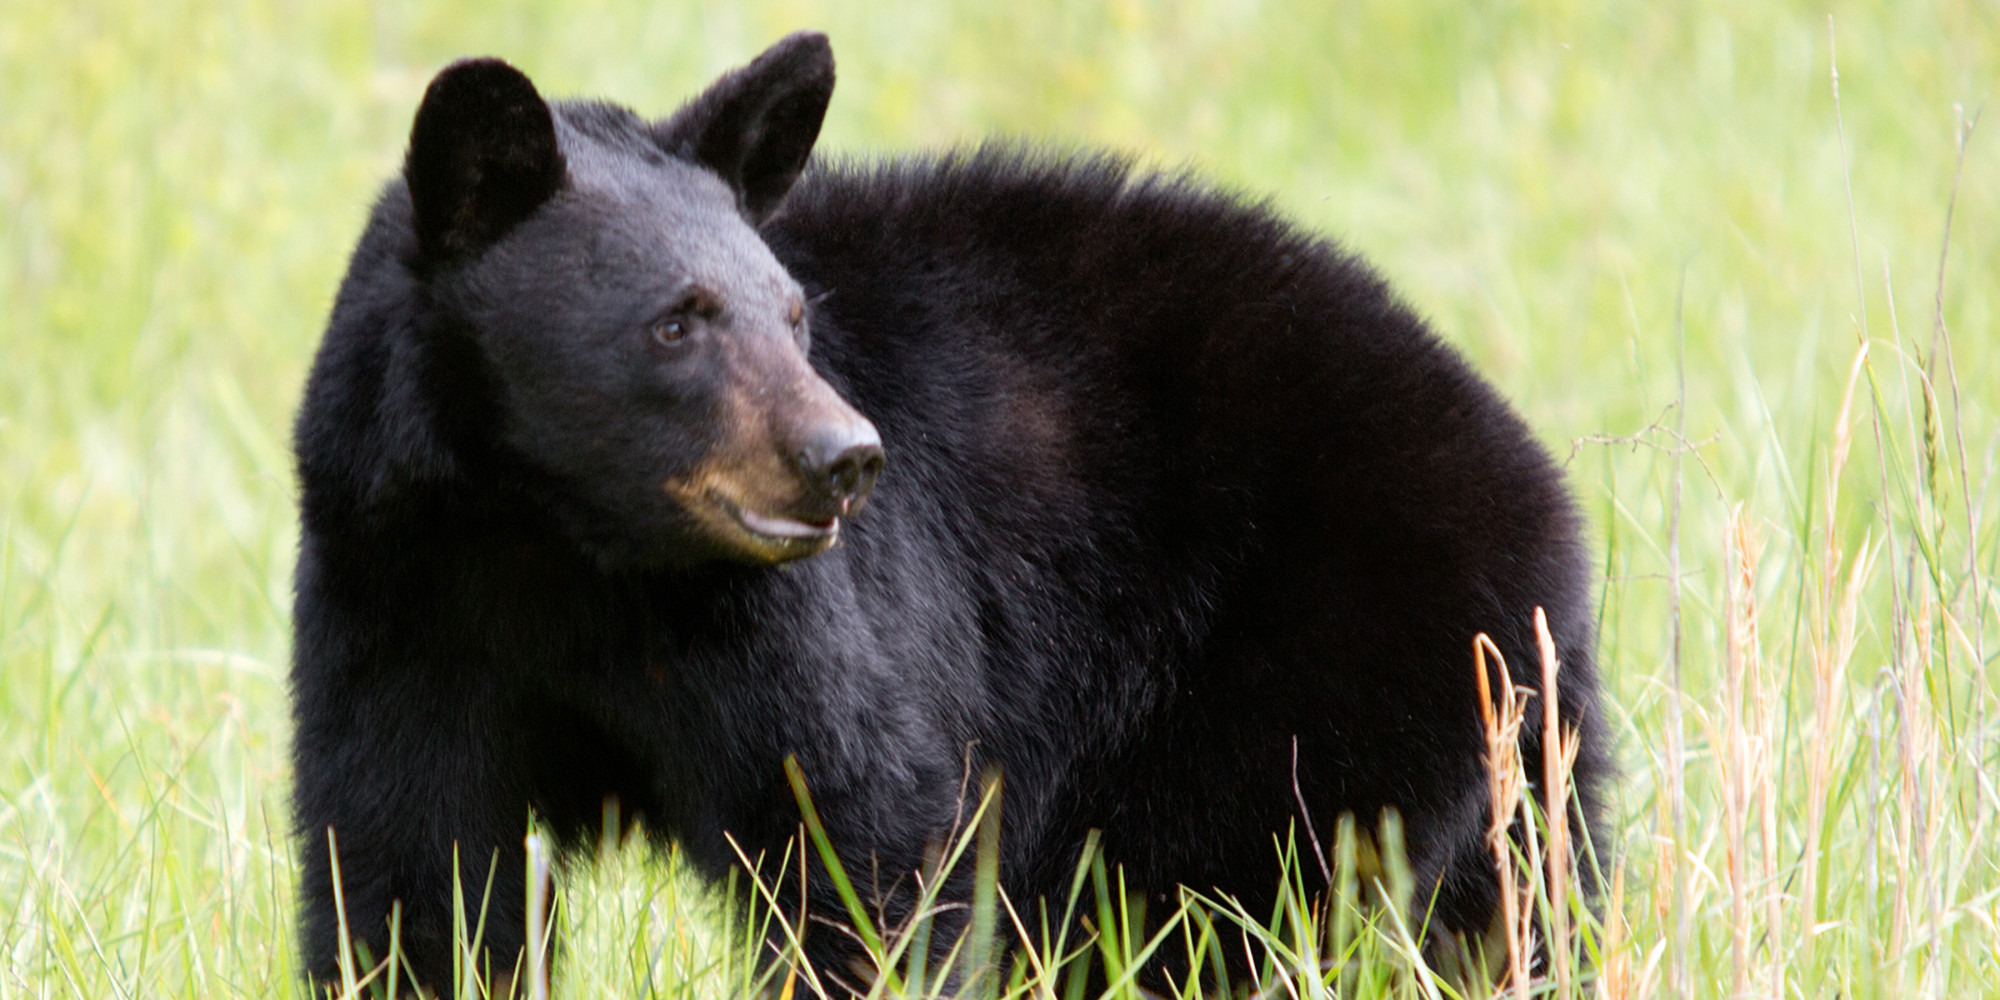 Black bear head profile - photo#7